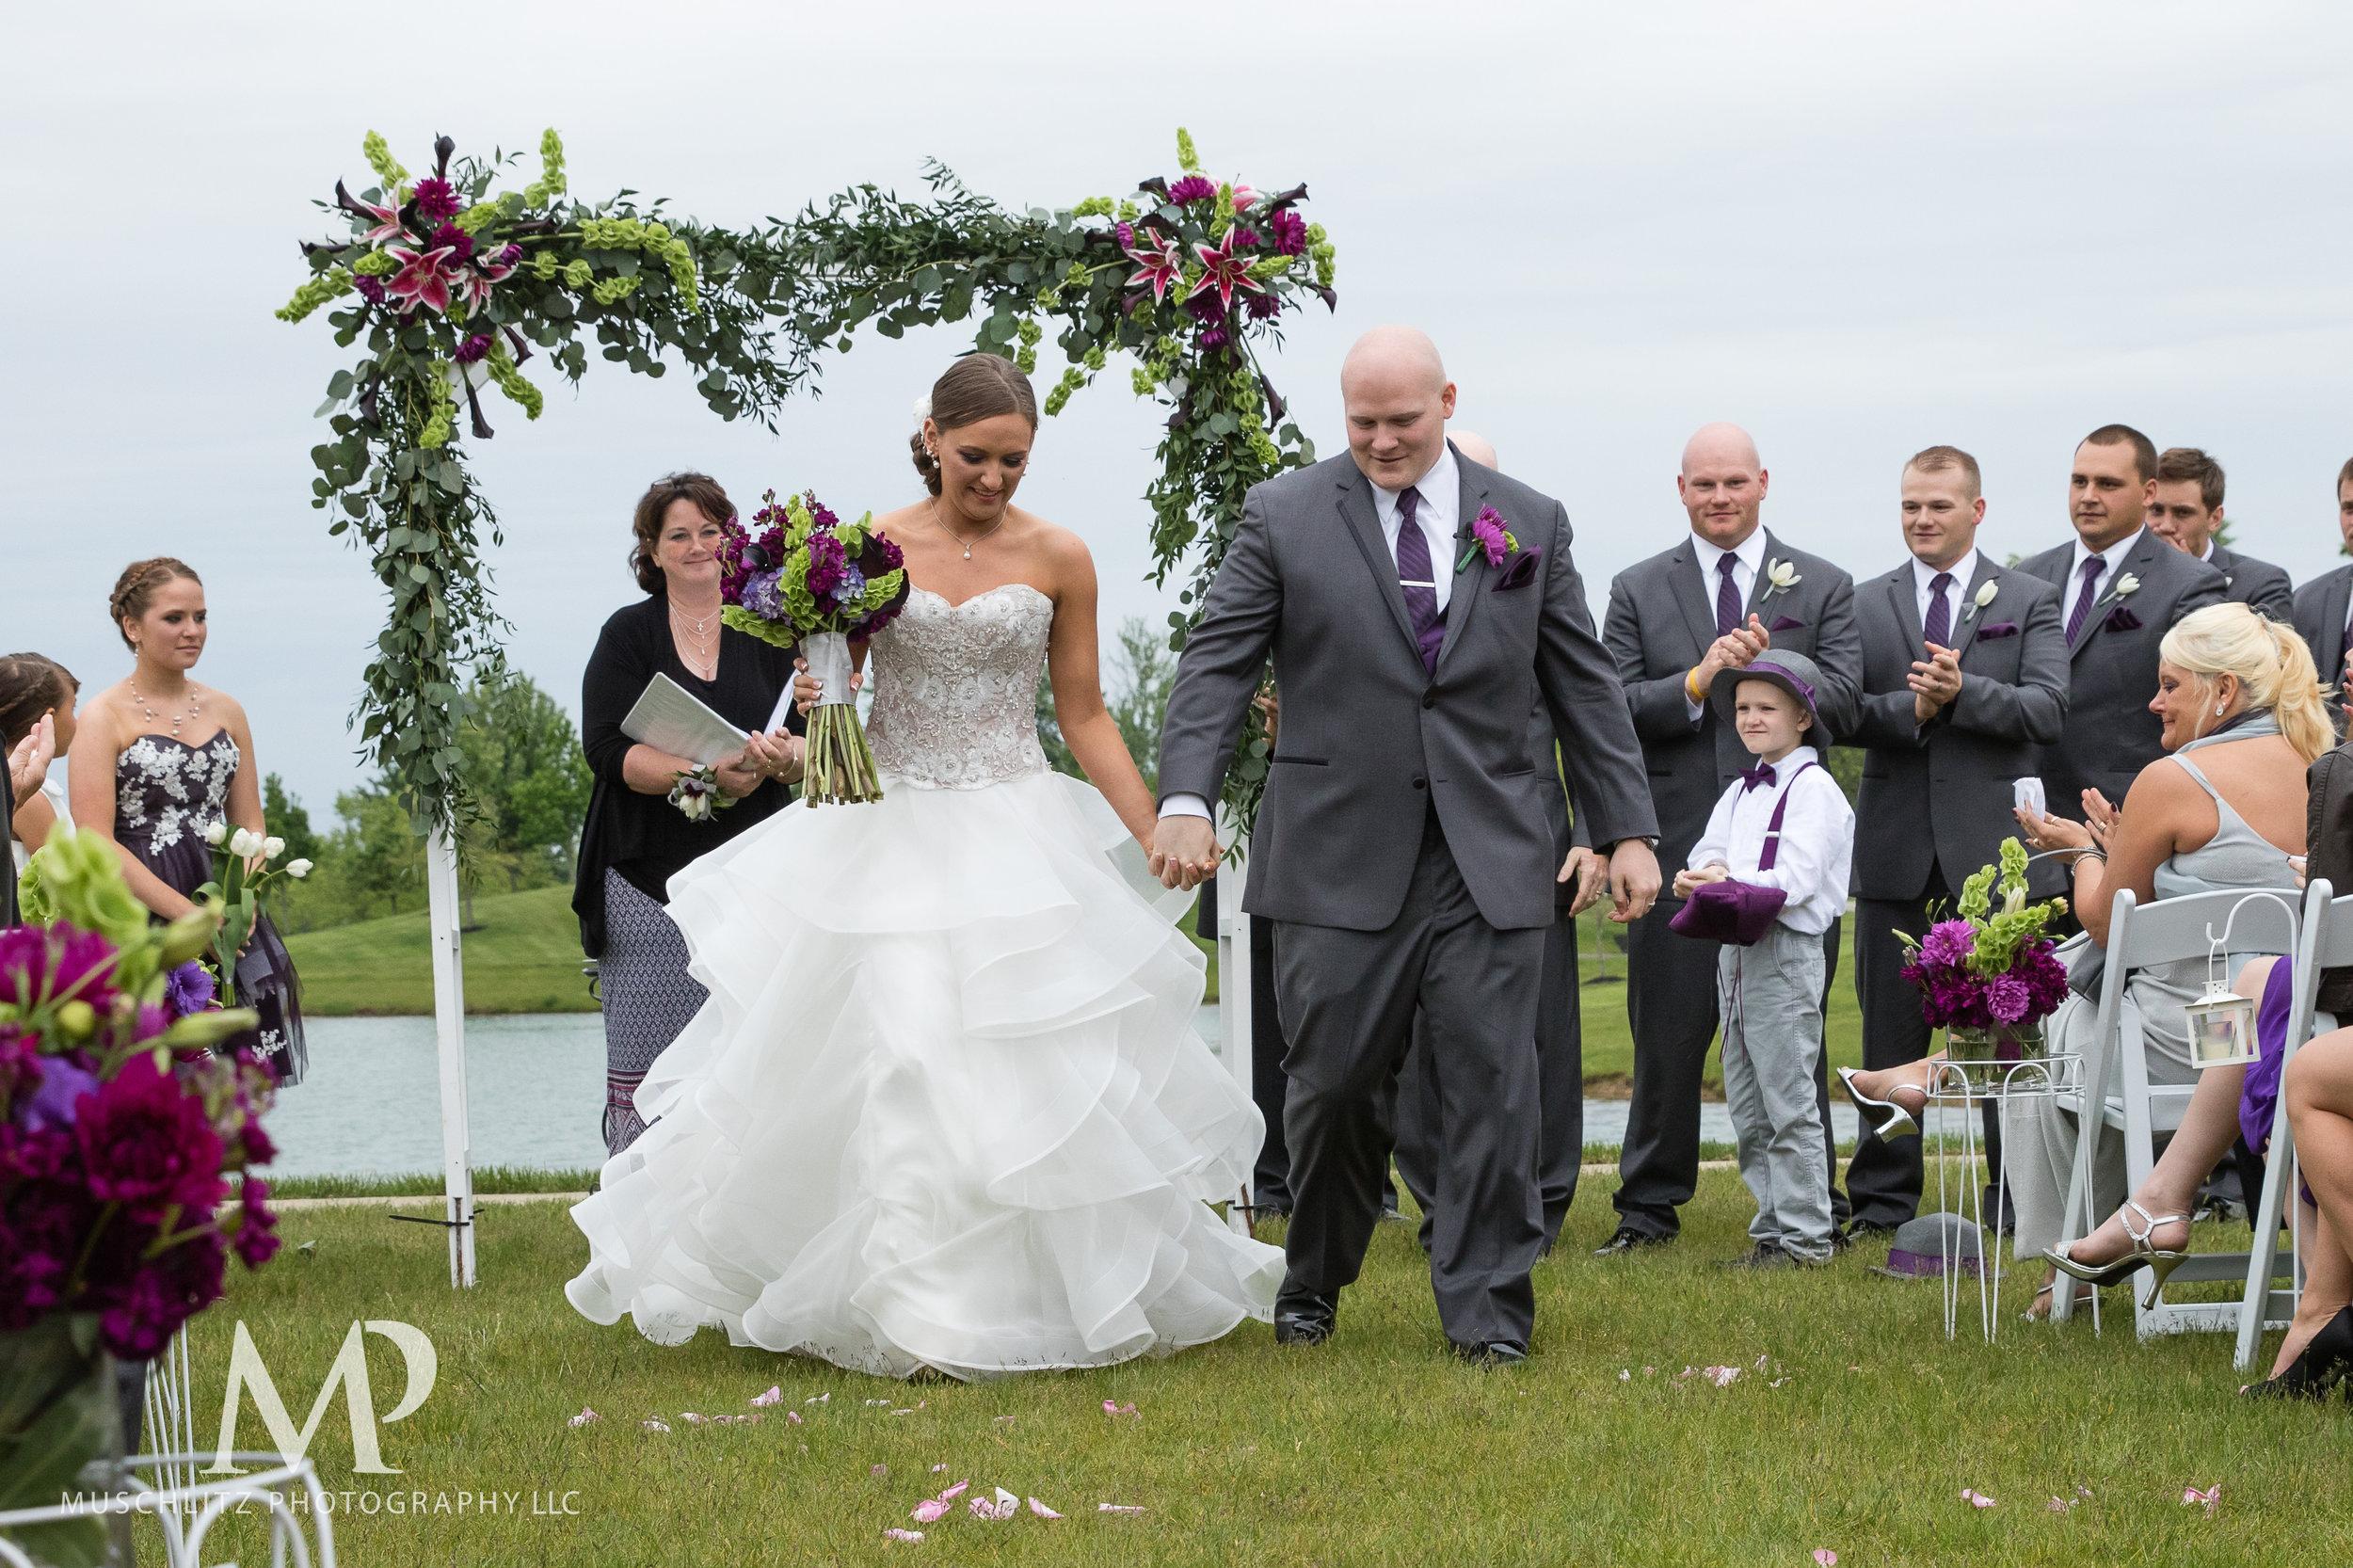 club-at-corazon-wedding-ceremony-reception-columbus-dublin-ohio-ohio-university-theme-045.JPG